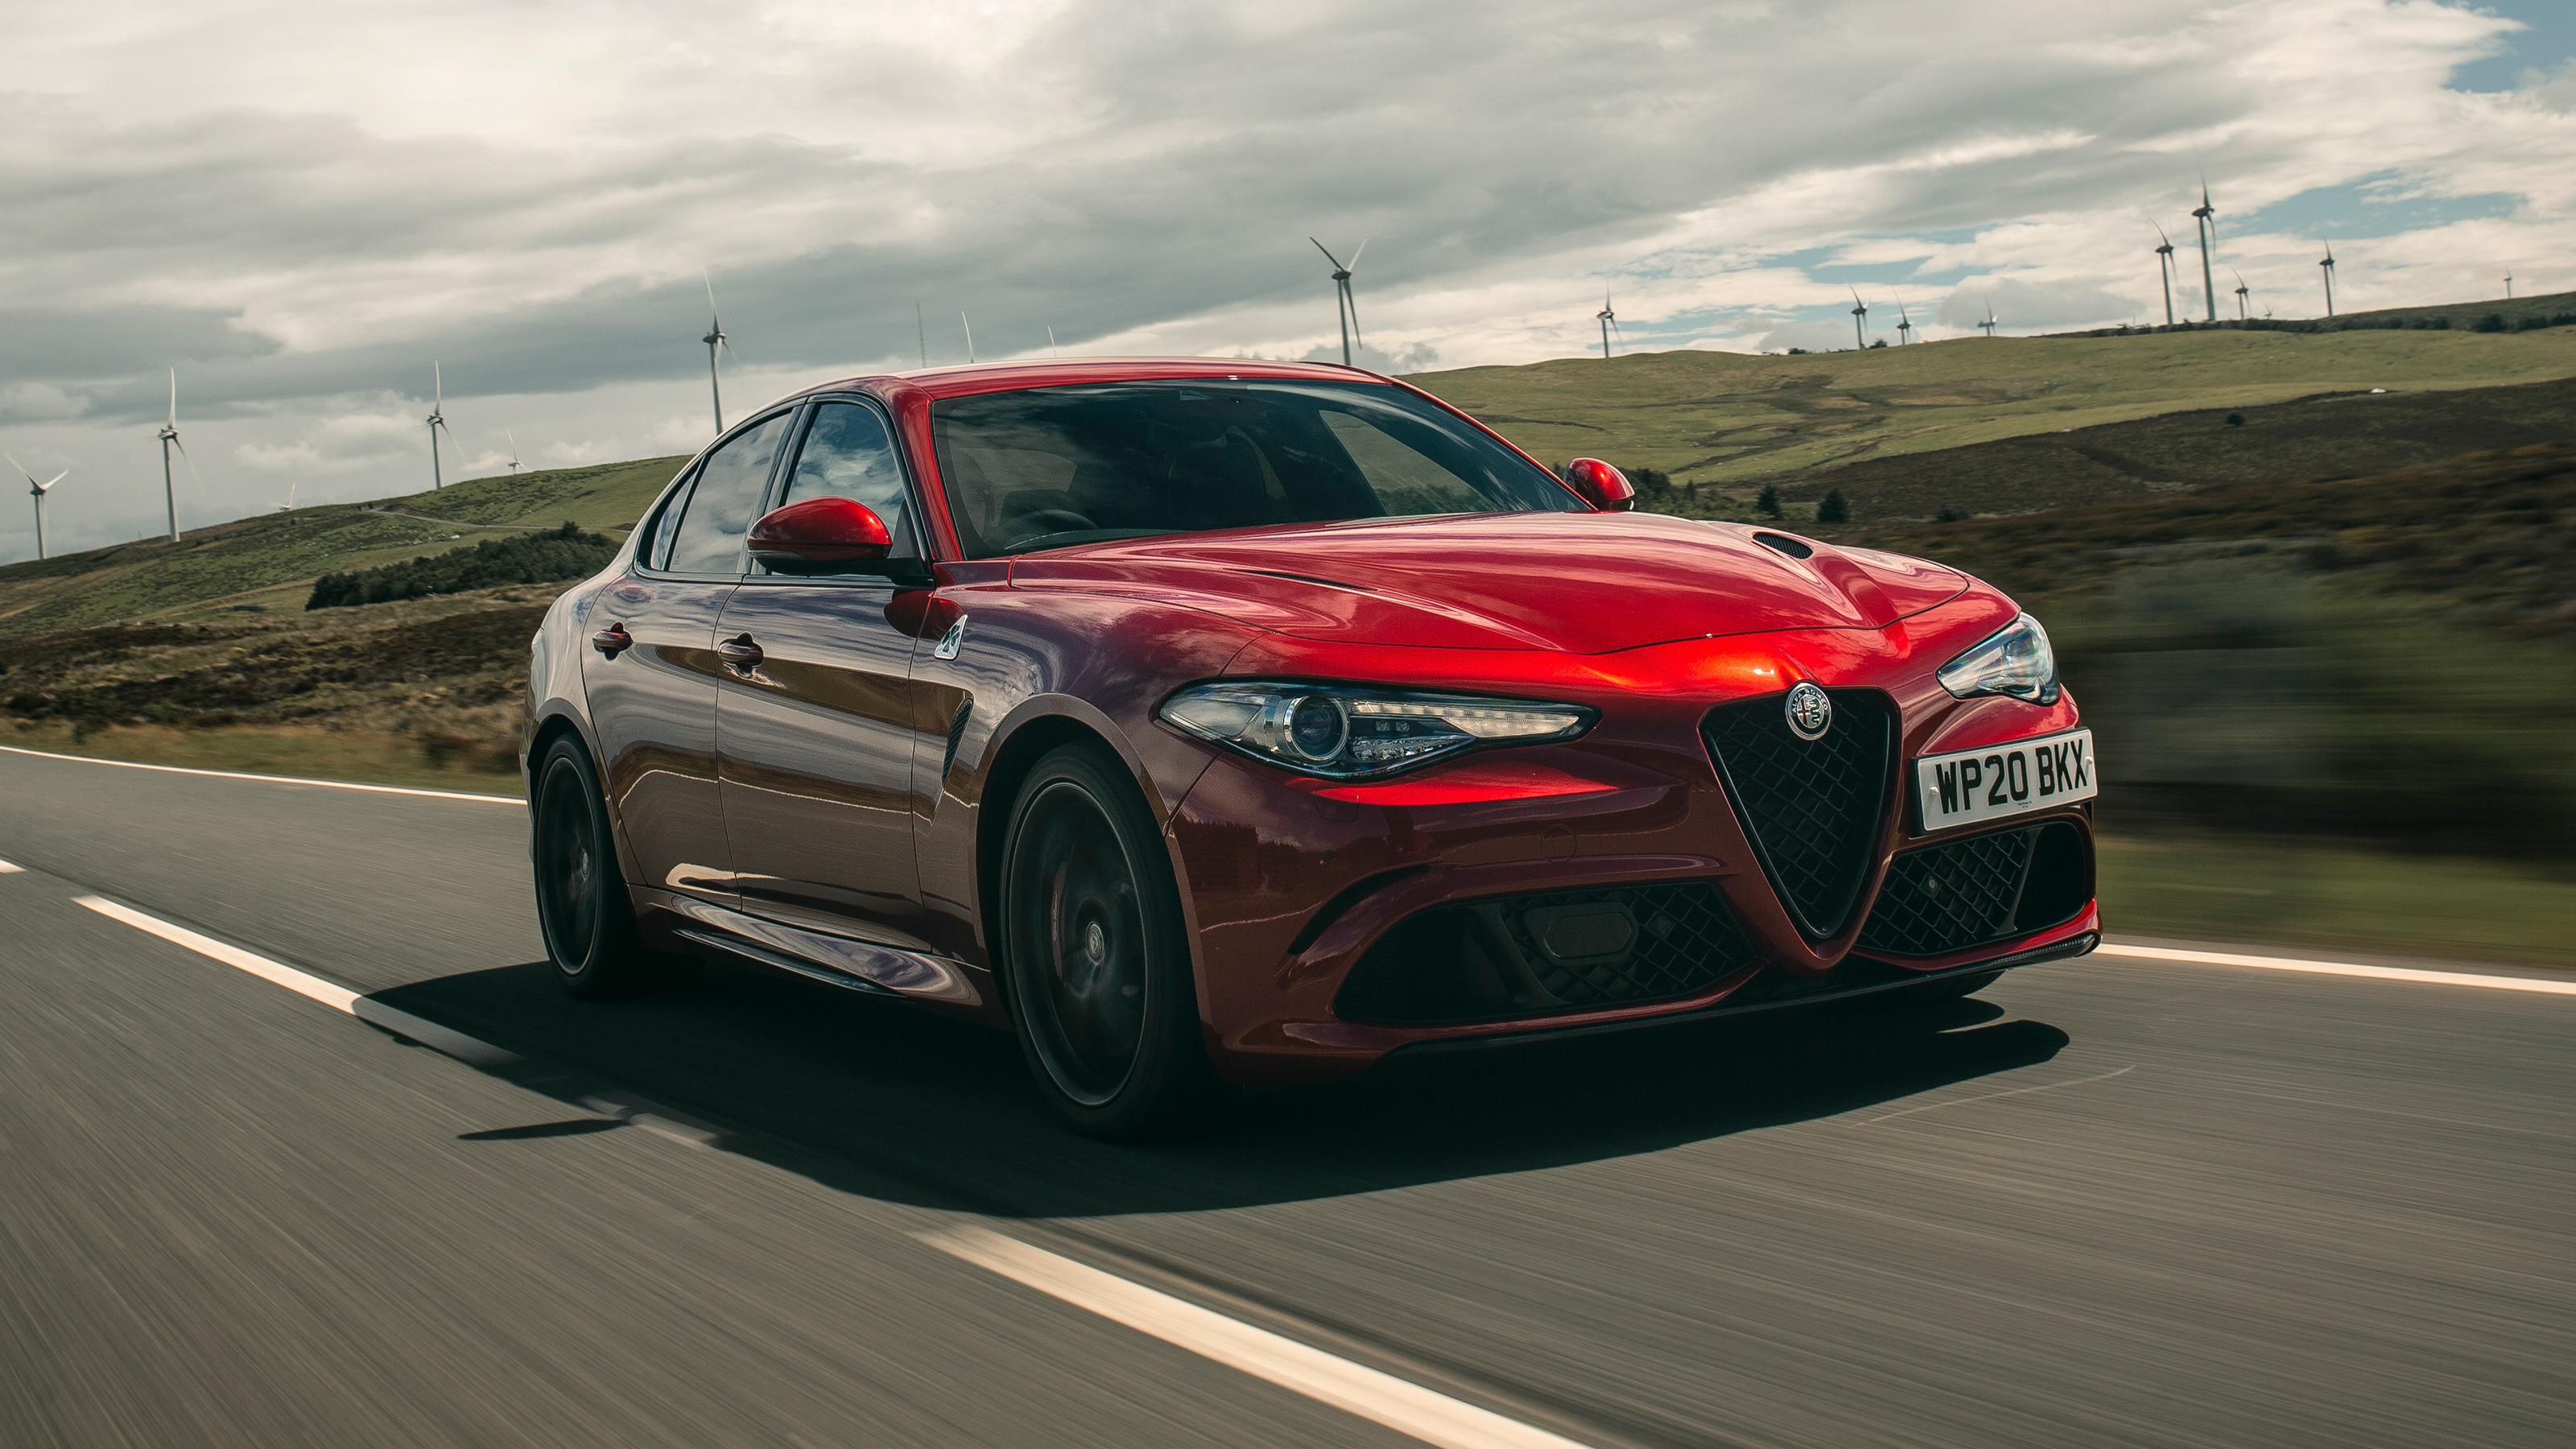 New Alfa Romeo Giulia Quadrifoglio 2020 review | Auto Express